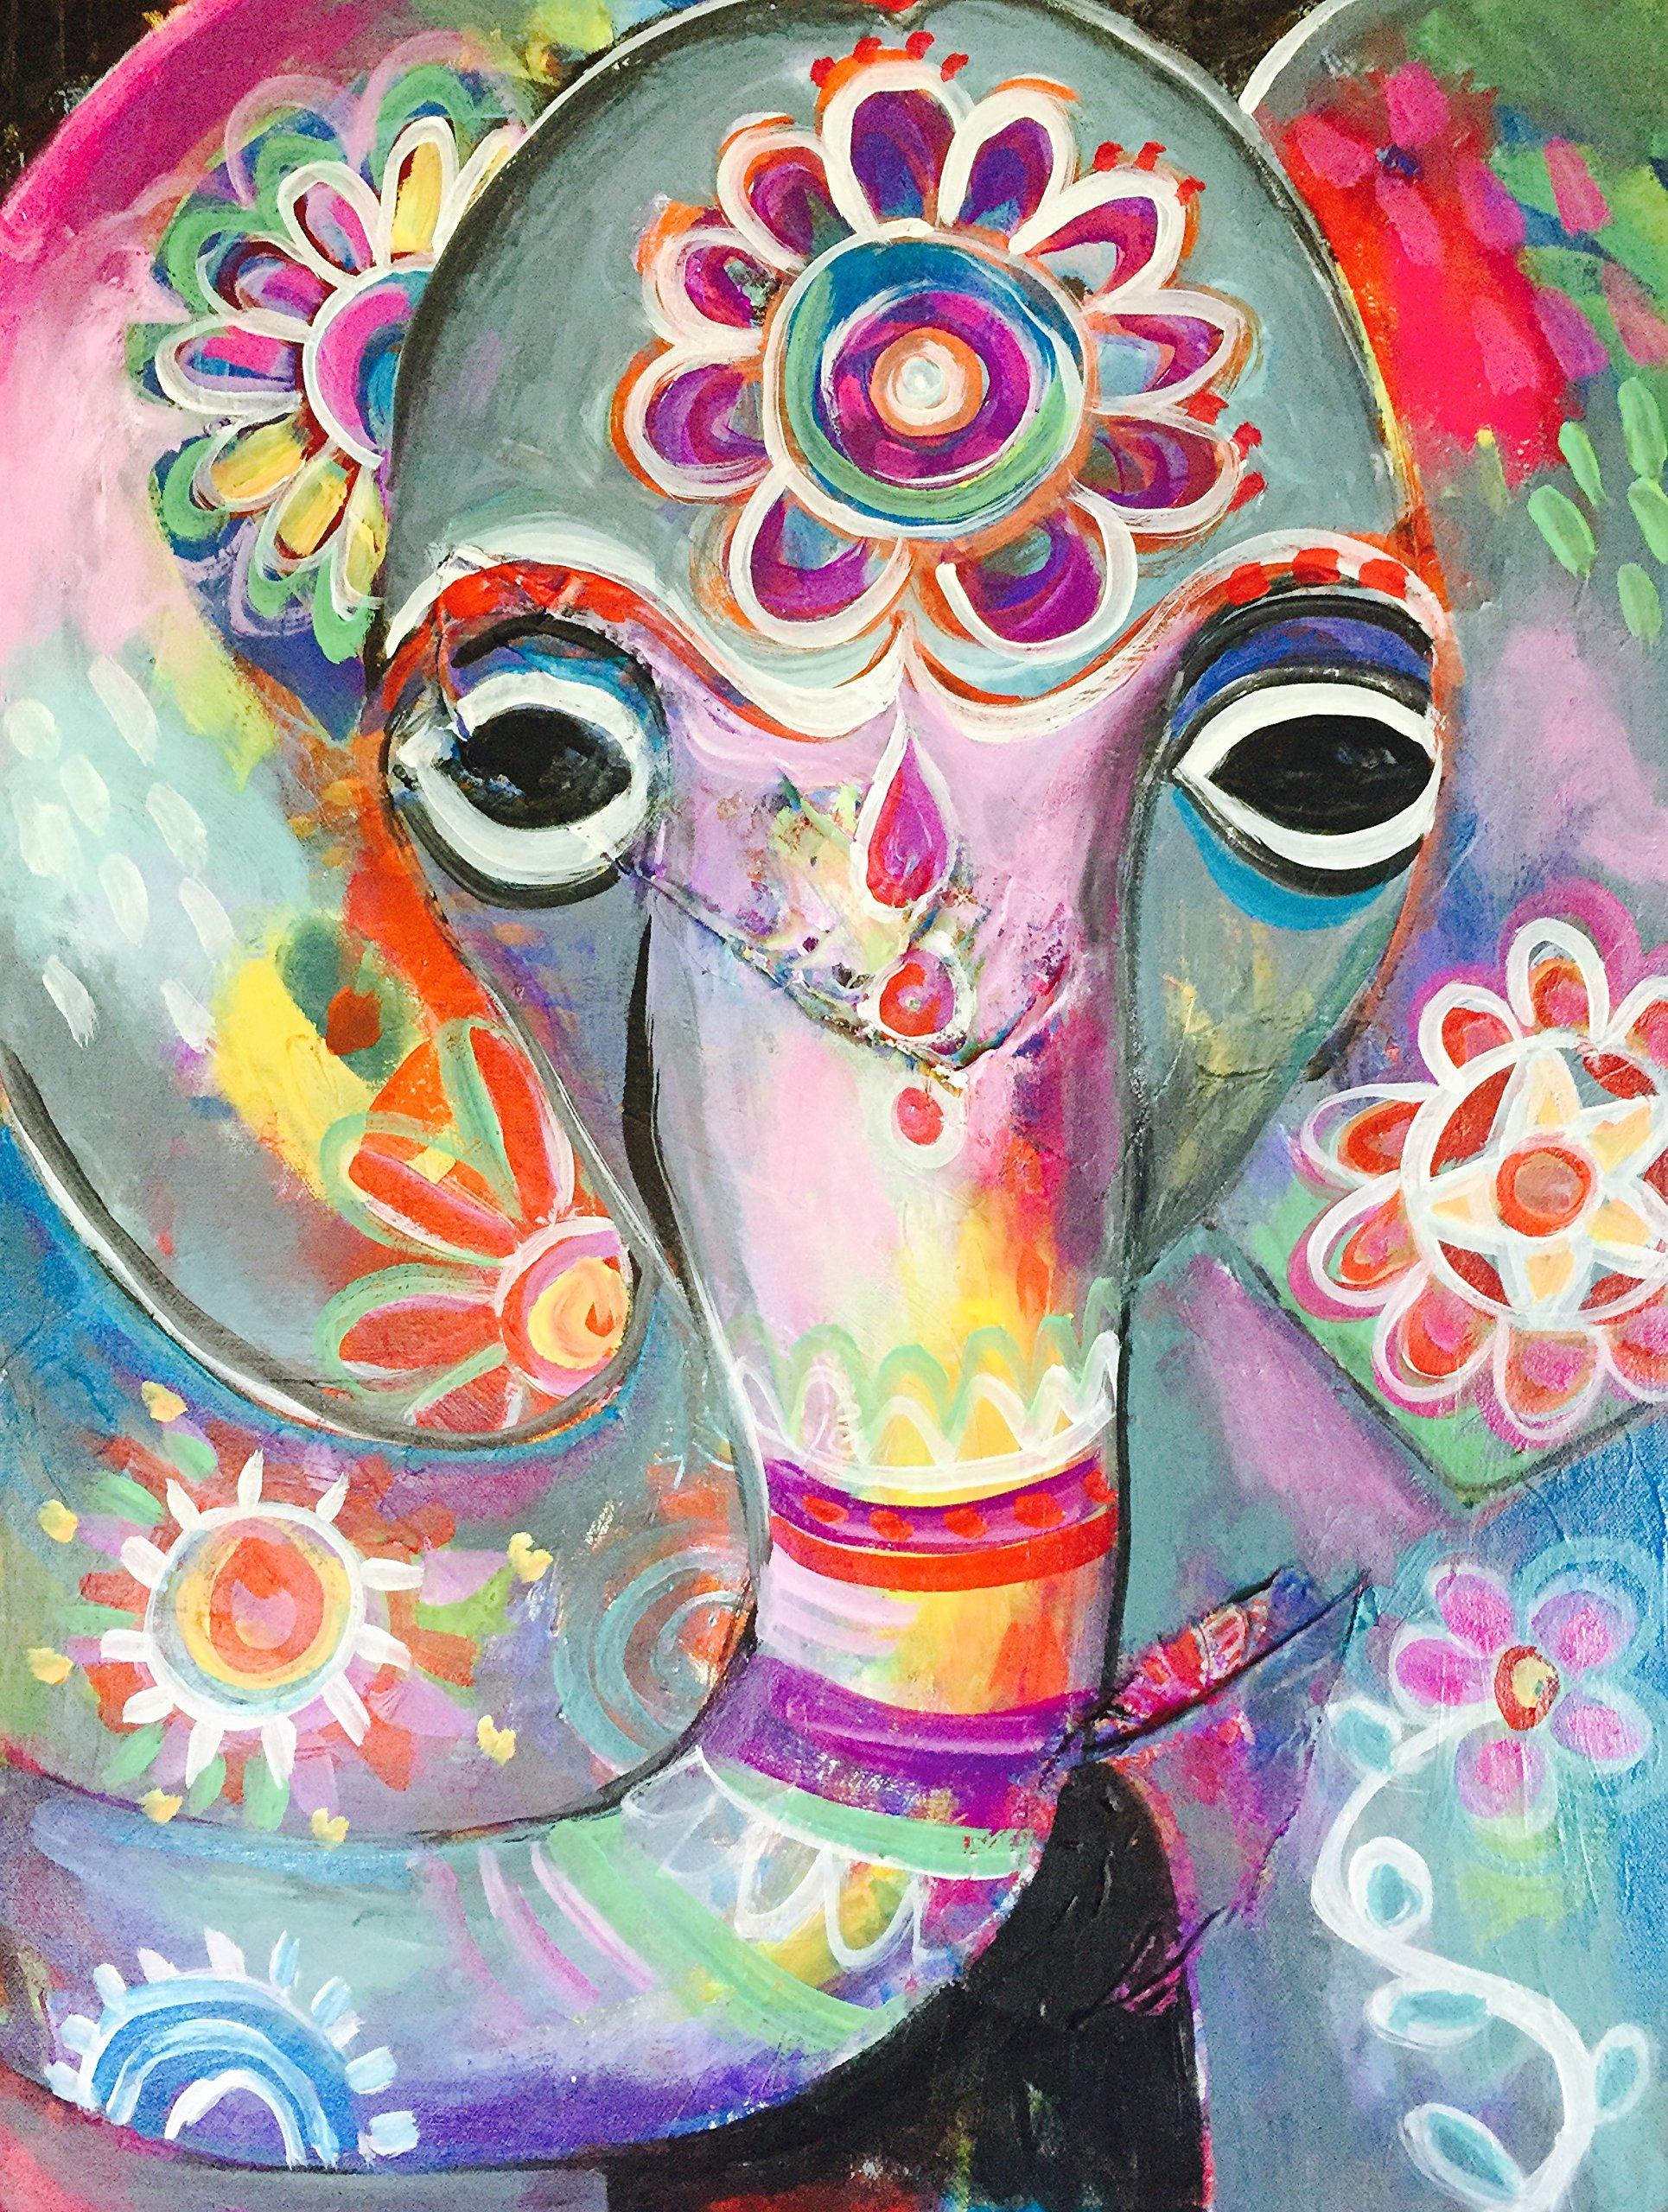 CF elephant love - no polaroid5.jpg